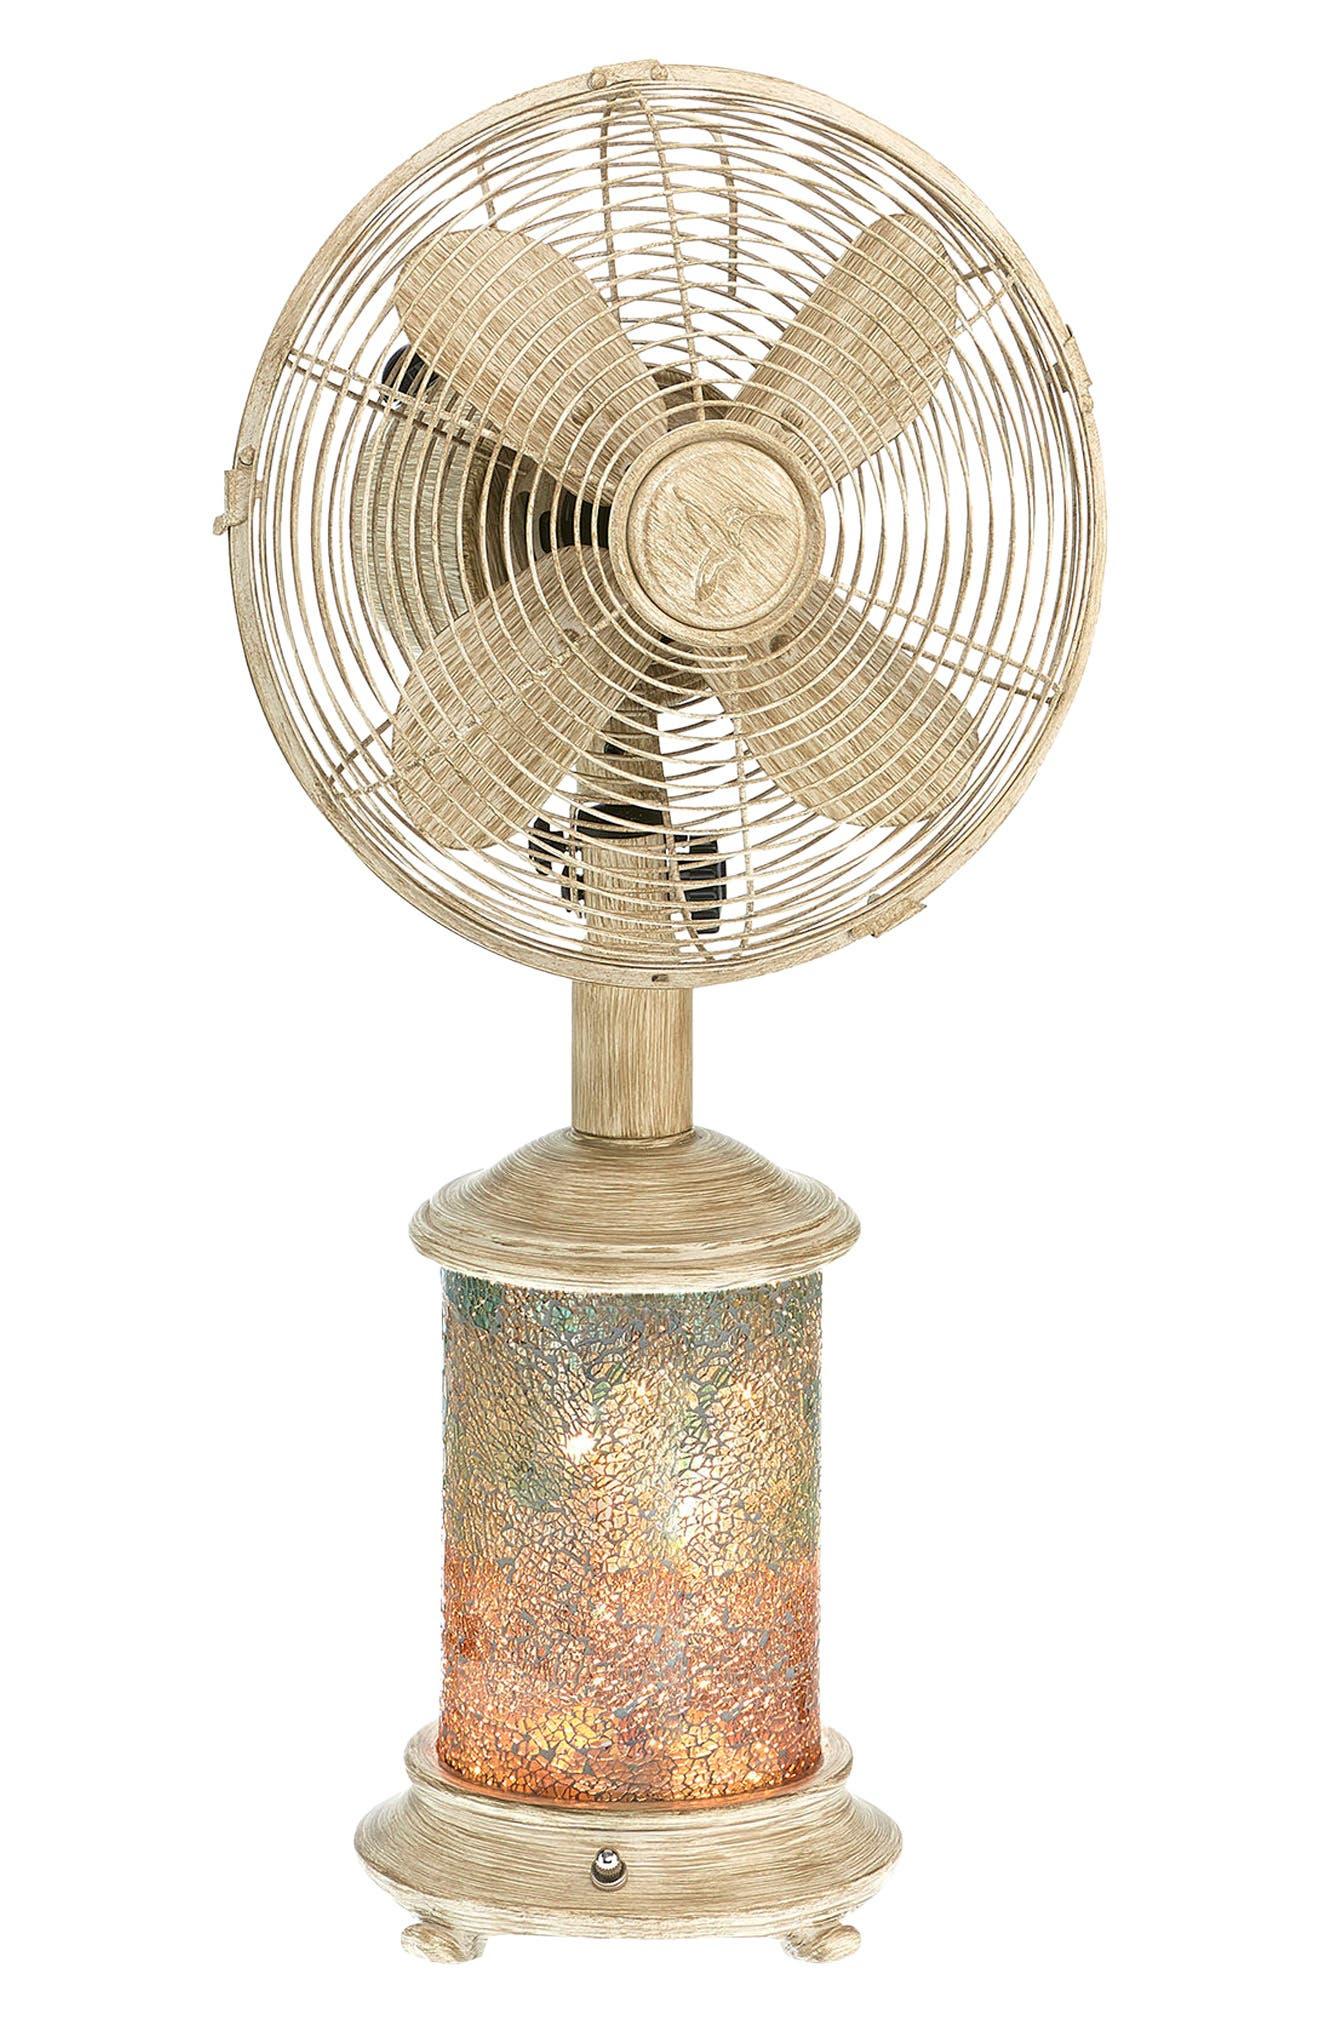 Sea Breeze Table Fan & Light,                             Main thumbnail 1, color,                             400